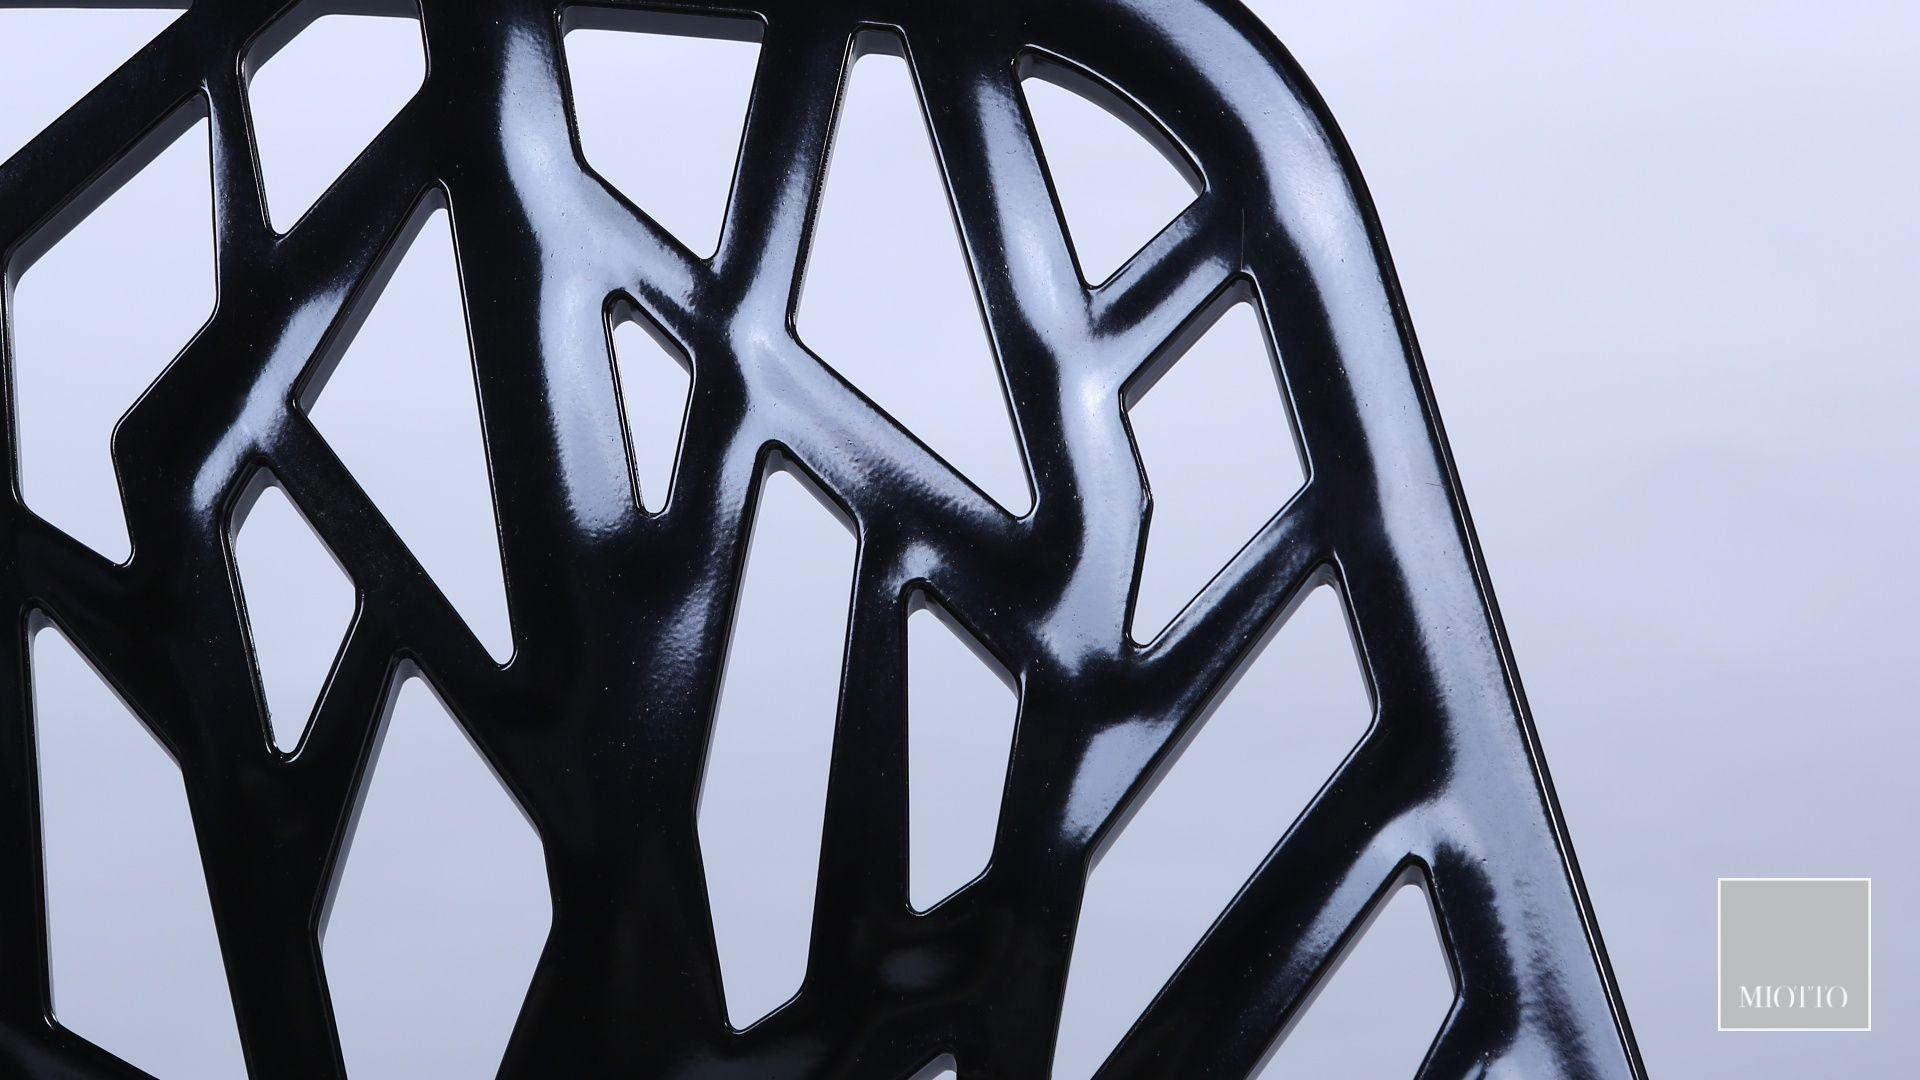 miotto_Furio_black_detail_0001_web